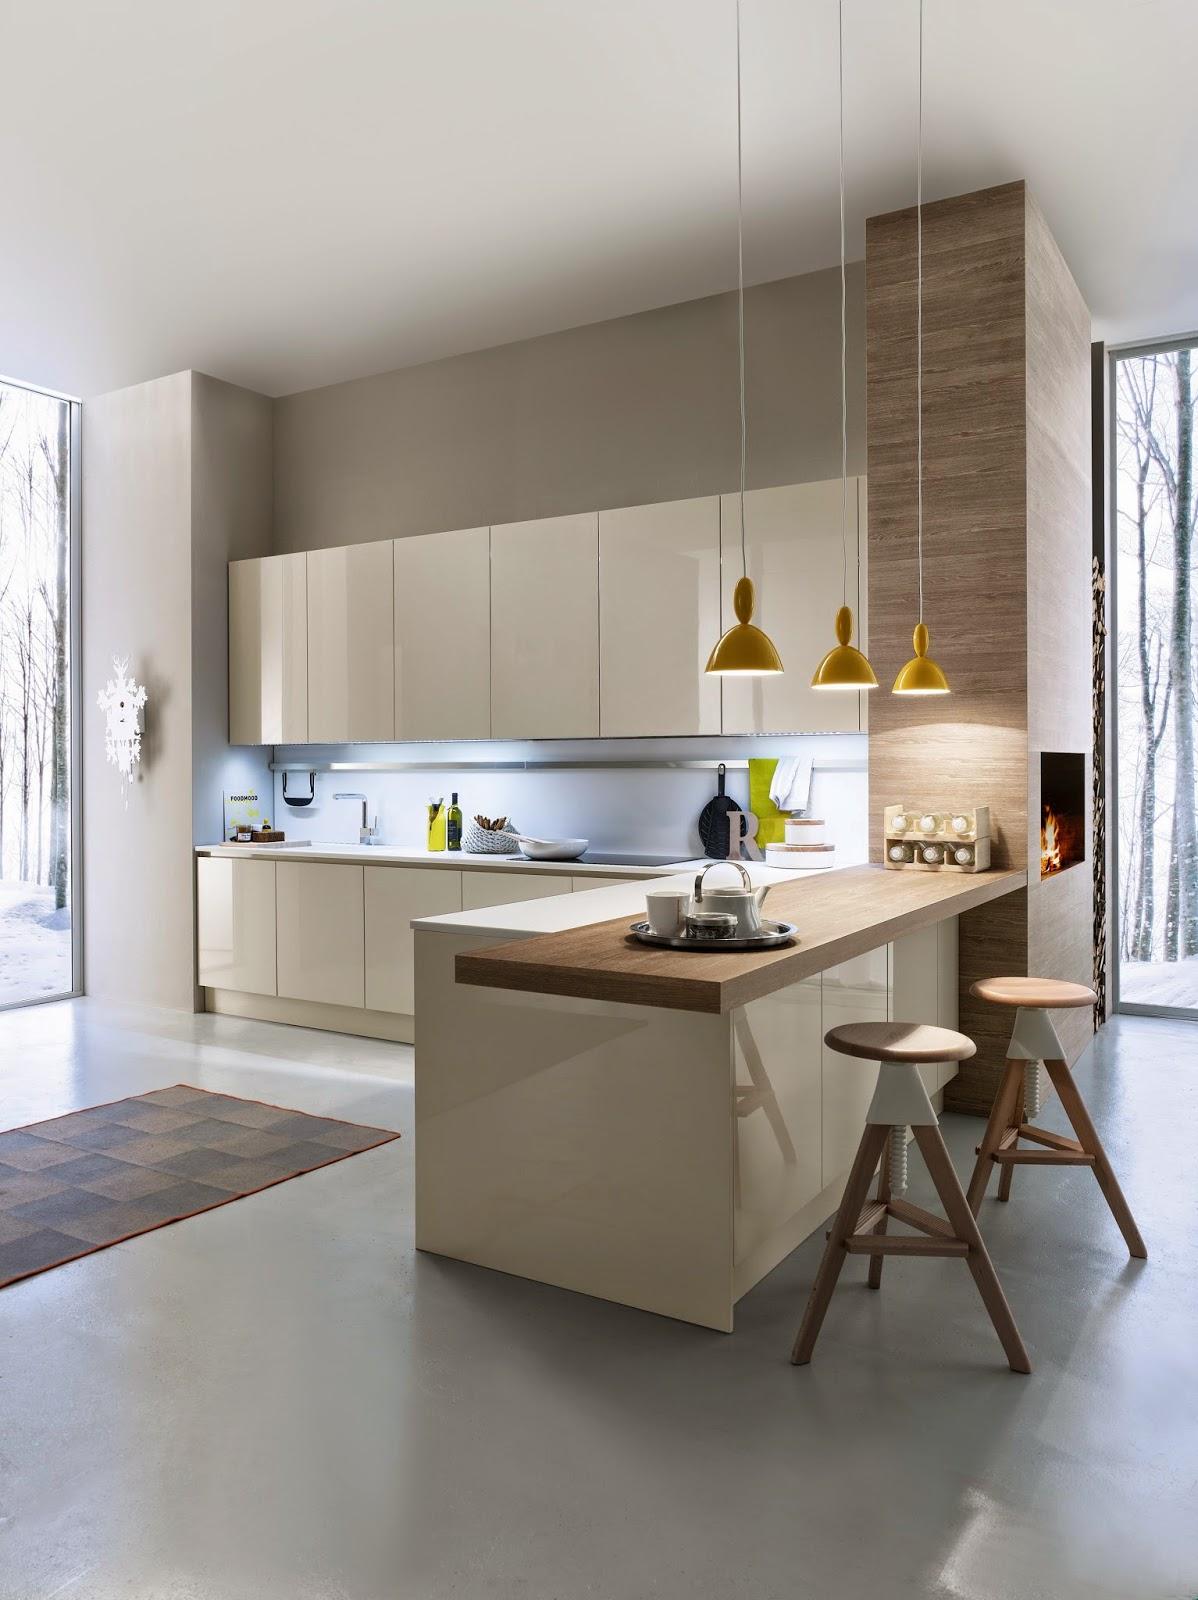 Italian Kitchens NYC - Kitchen design nyc